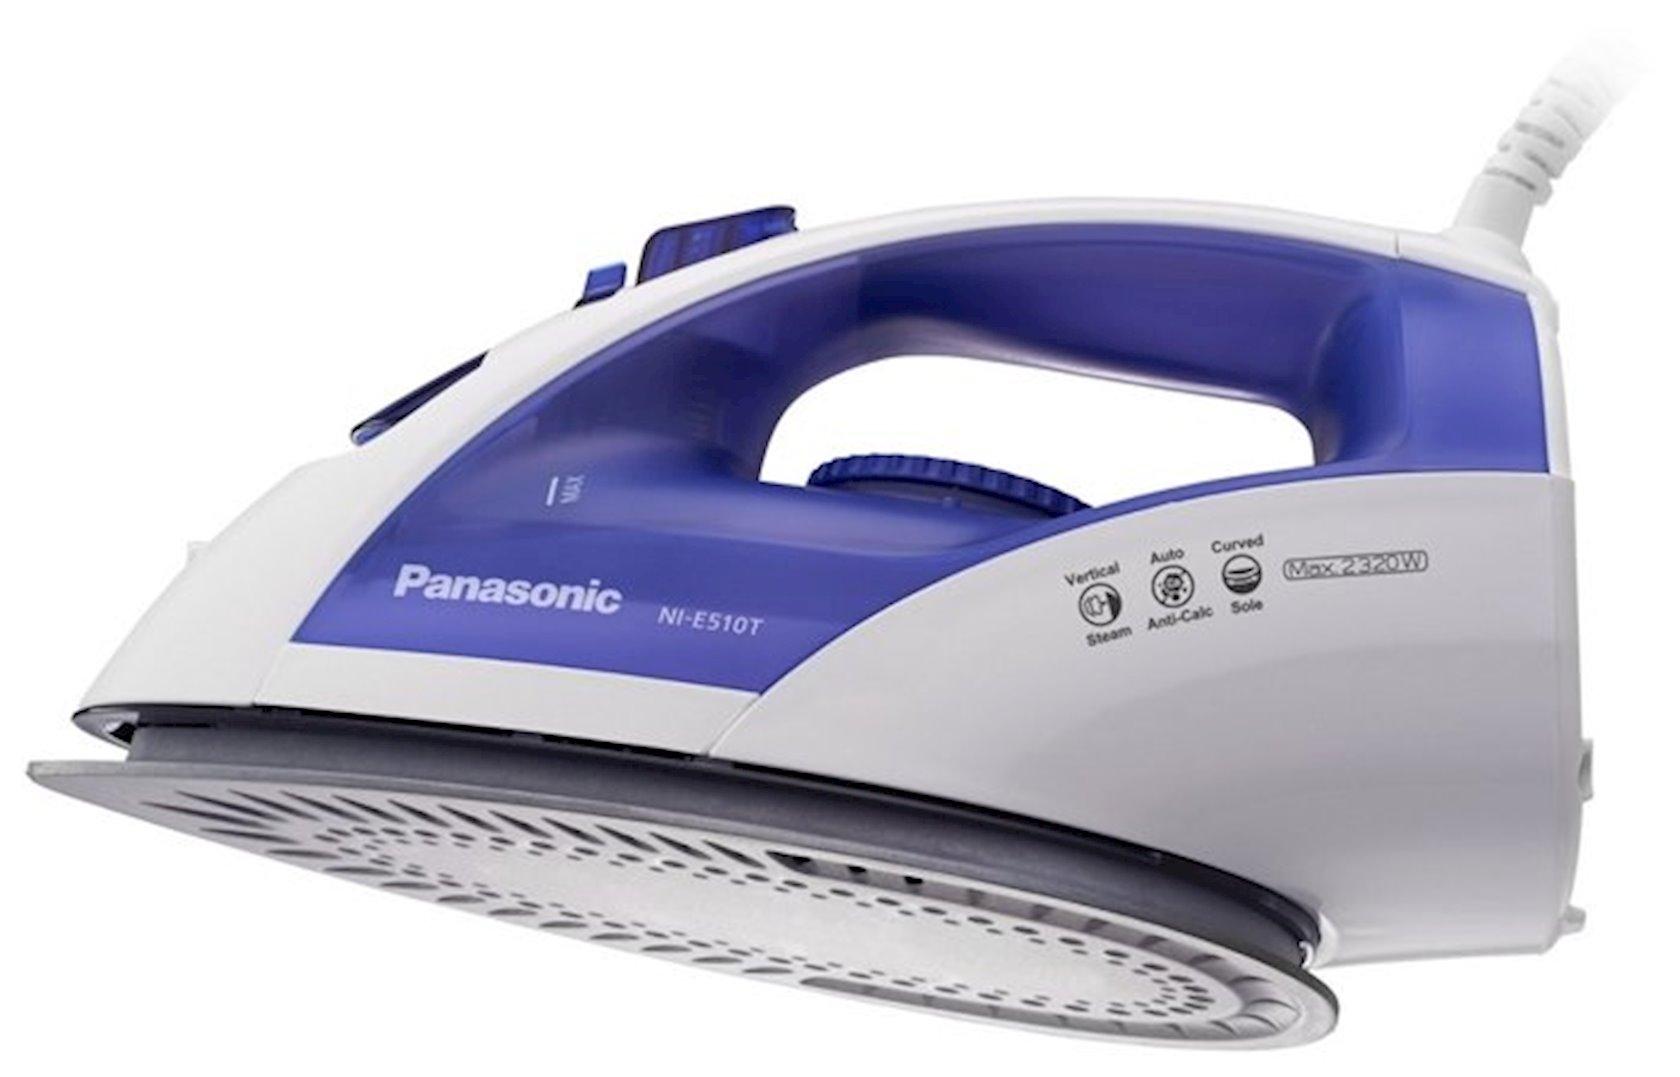 Ütü Panasonic NI-E510TDTW, göy